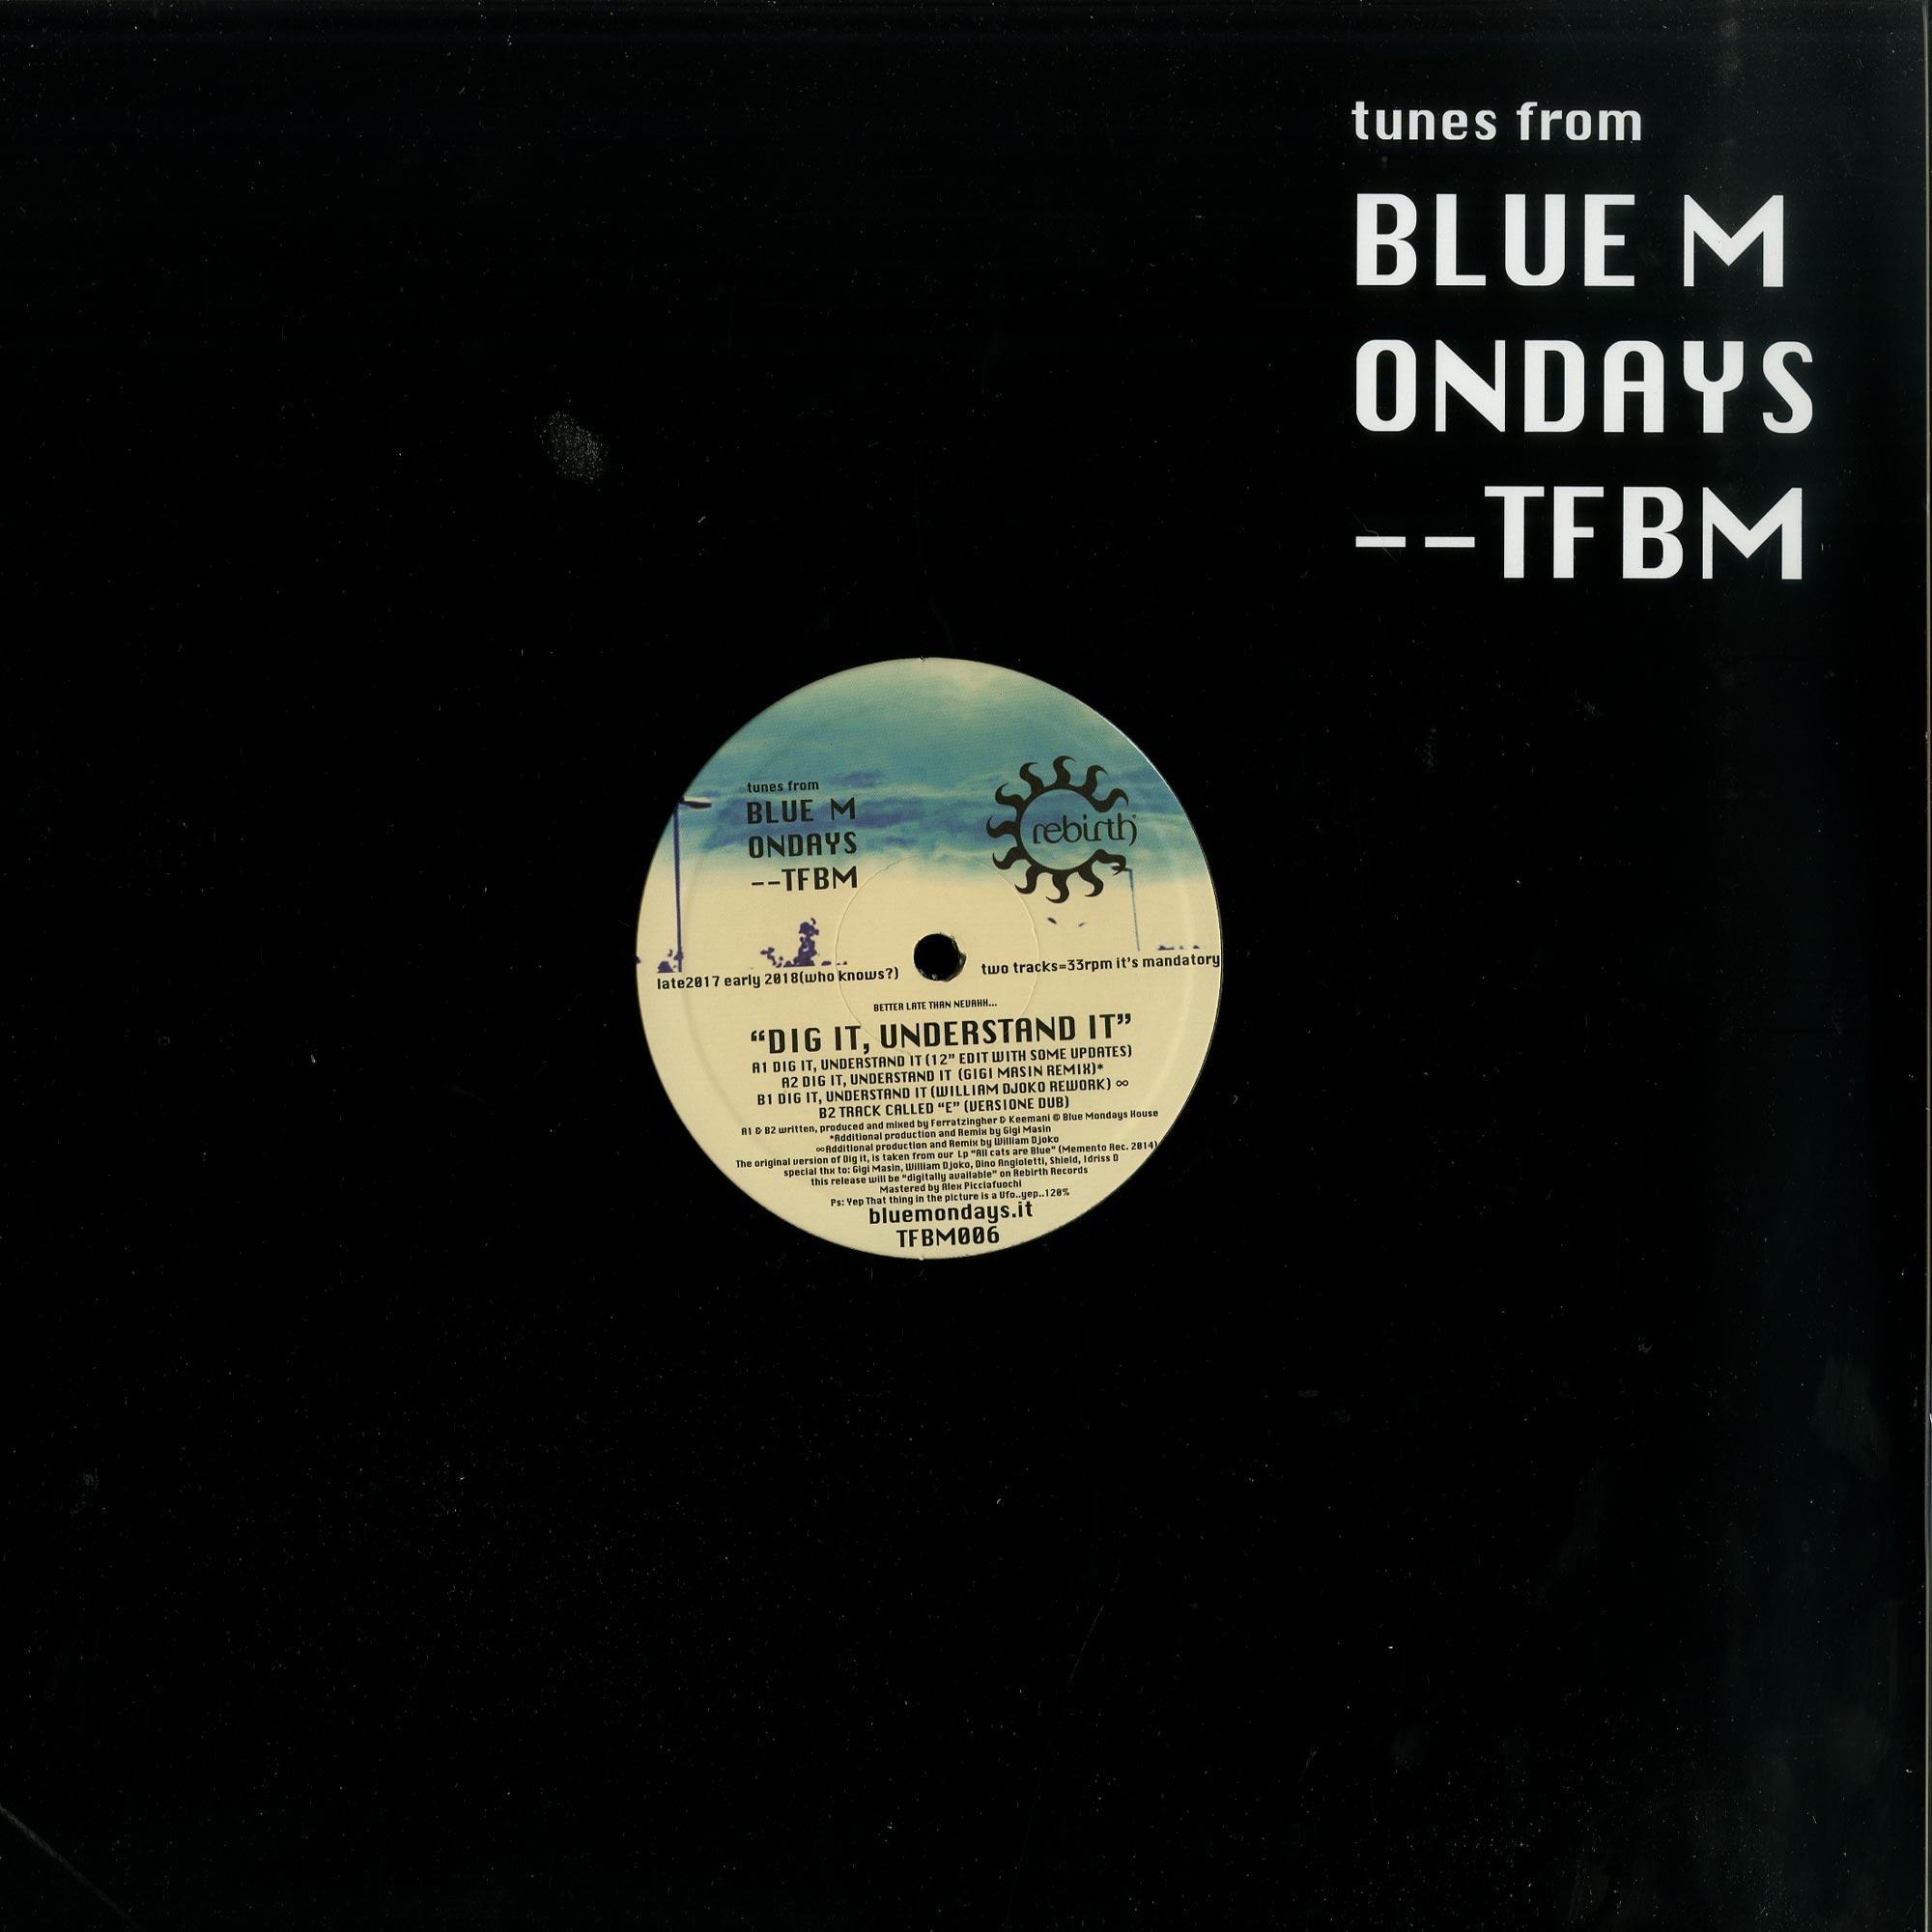 Blue Mondays - DIG IT UNDERSTAND IT